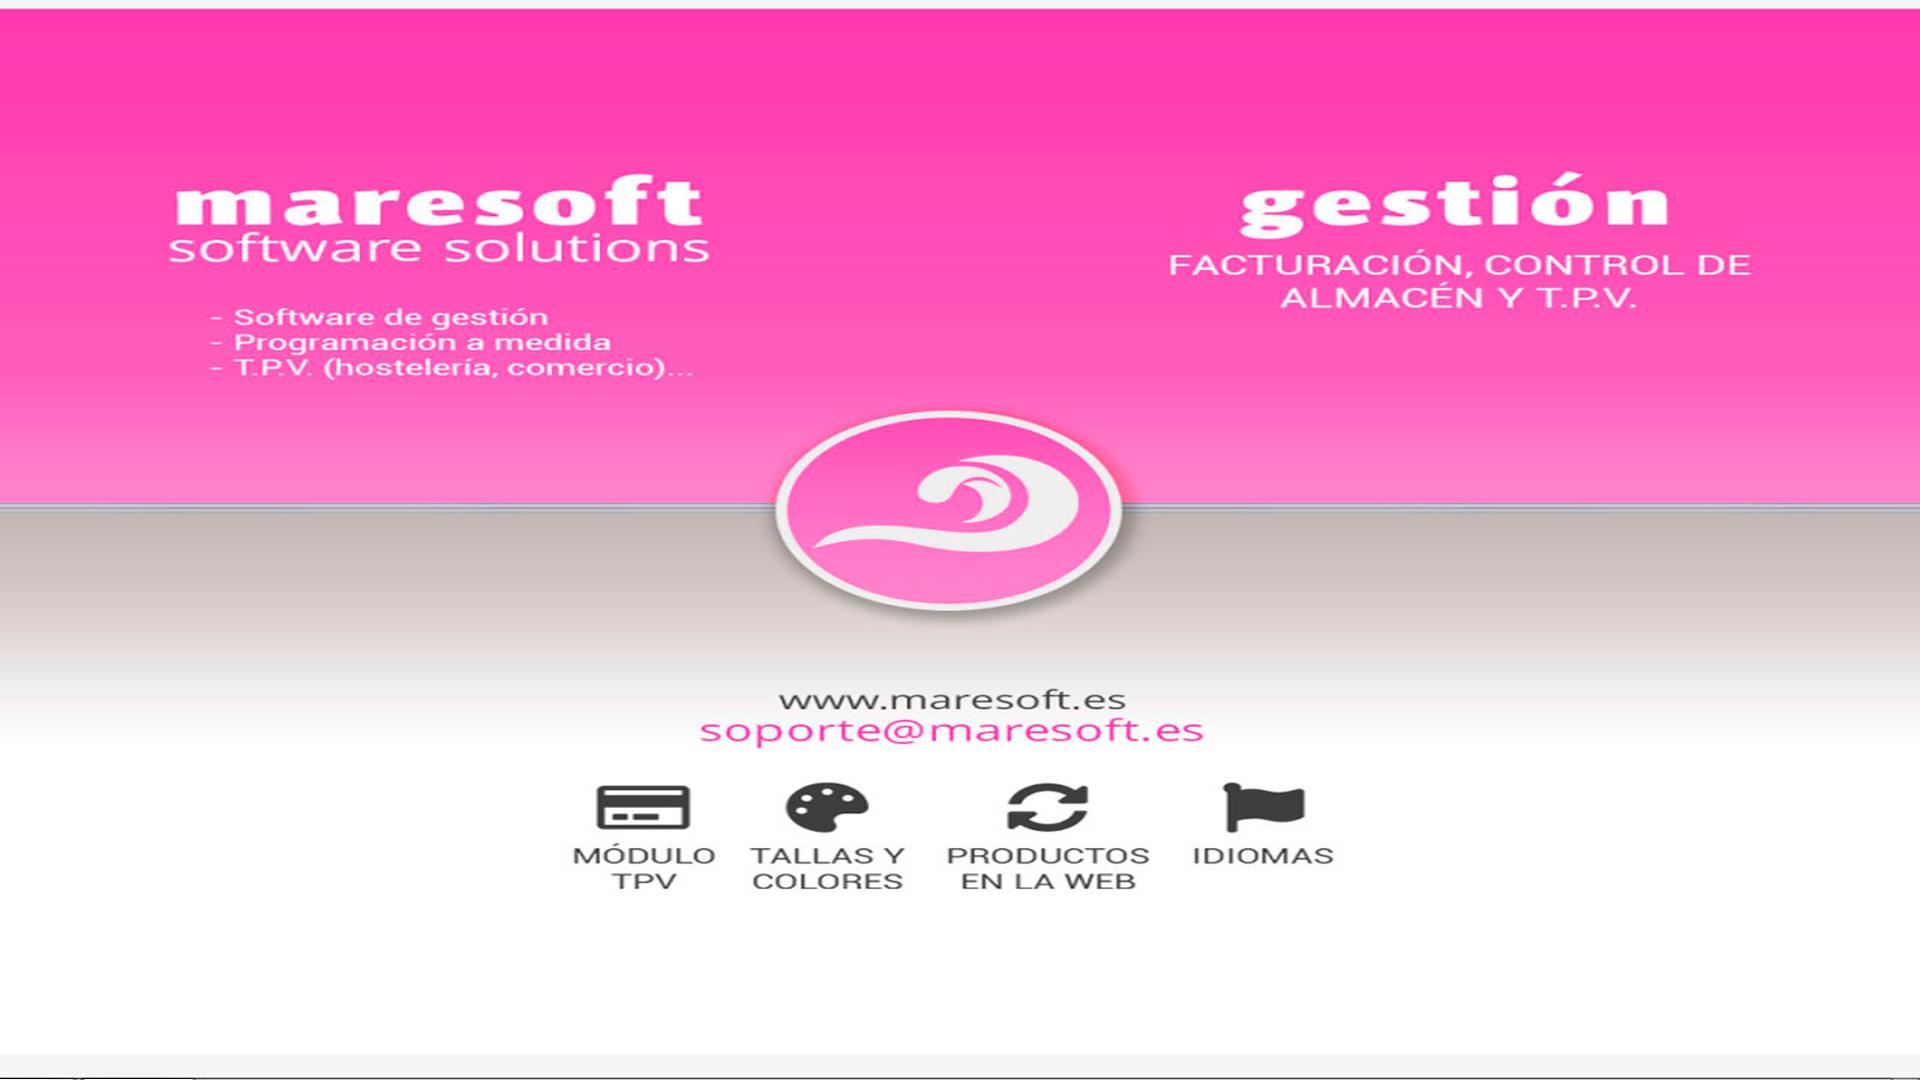 MARESOFT Software Solutions